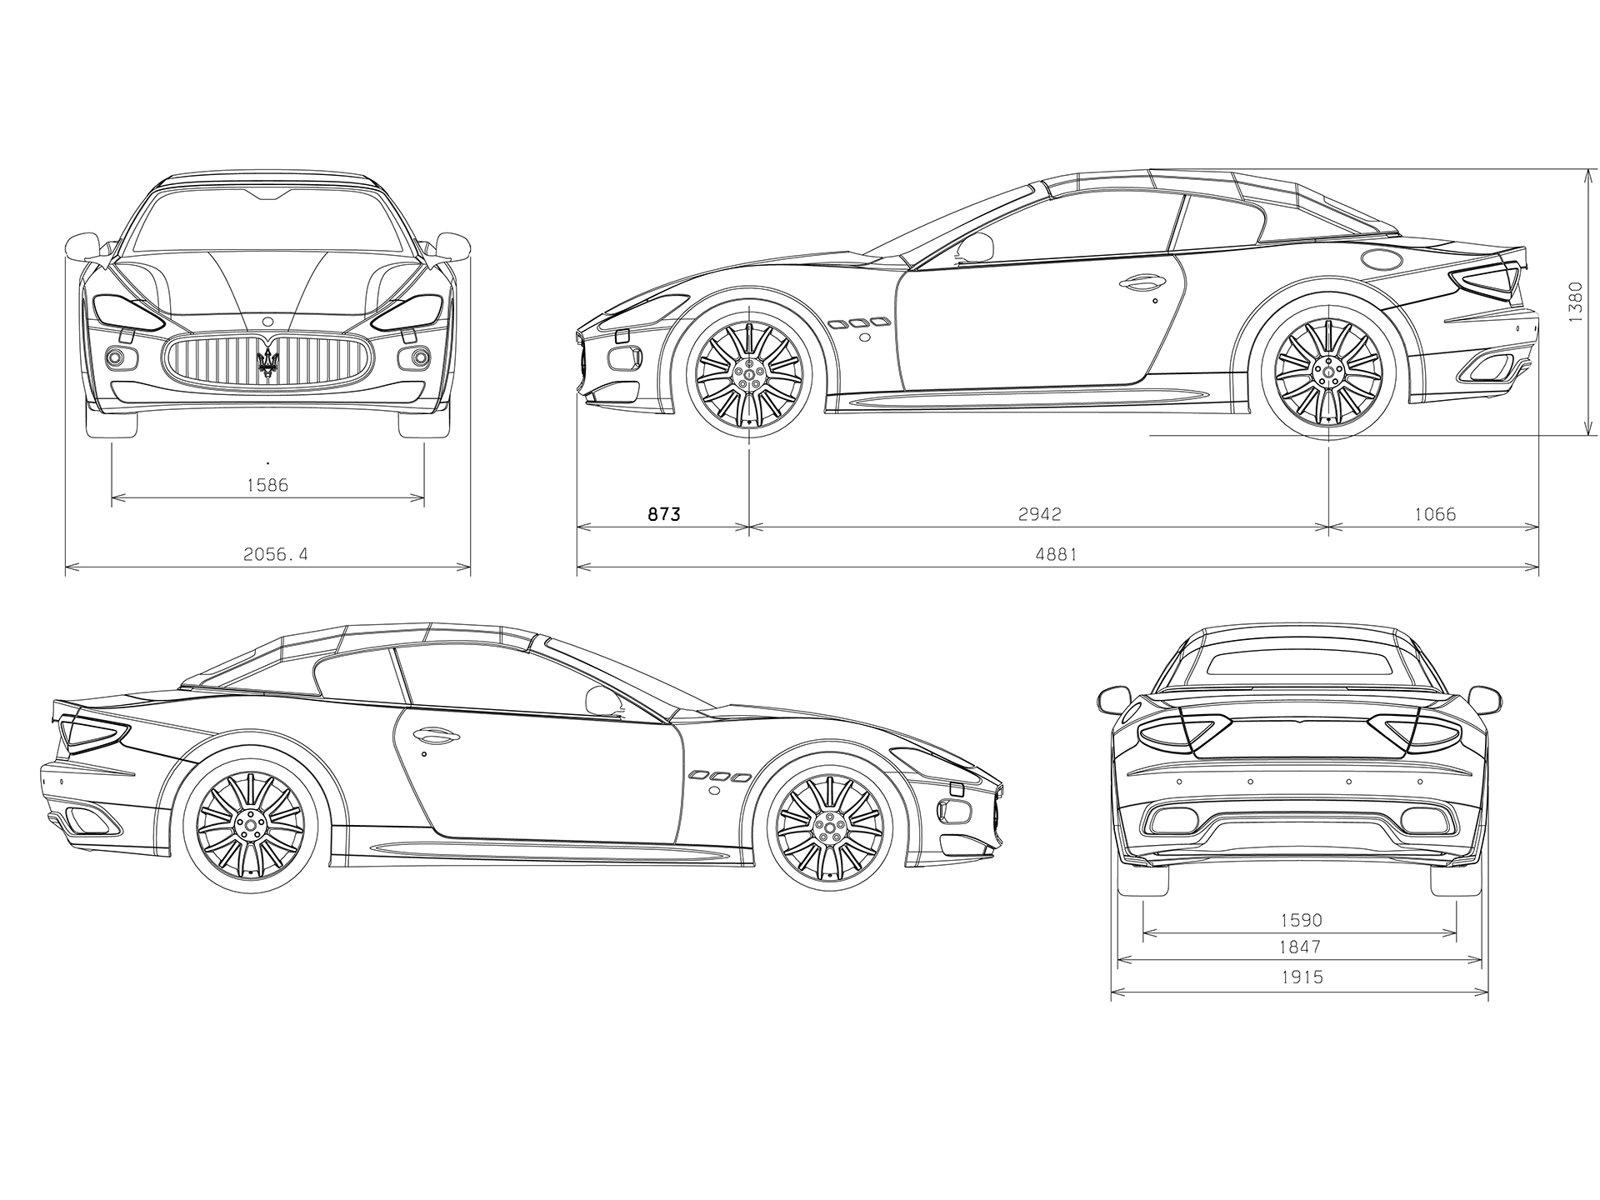 3d Auto Club Blueprints Of Cars